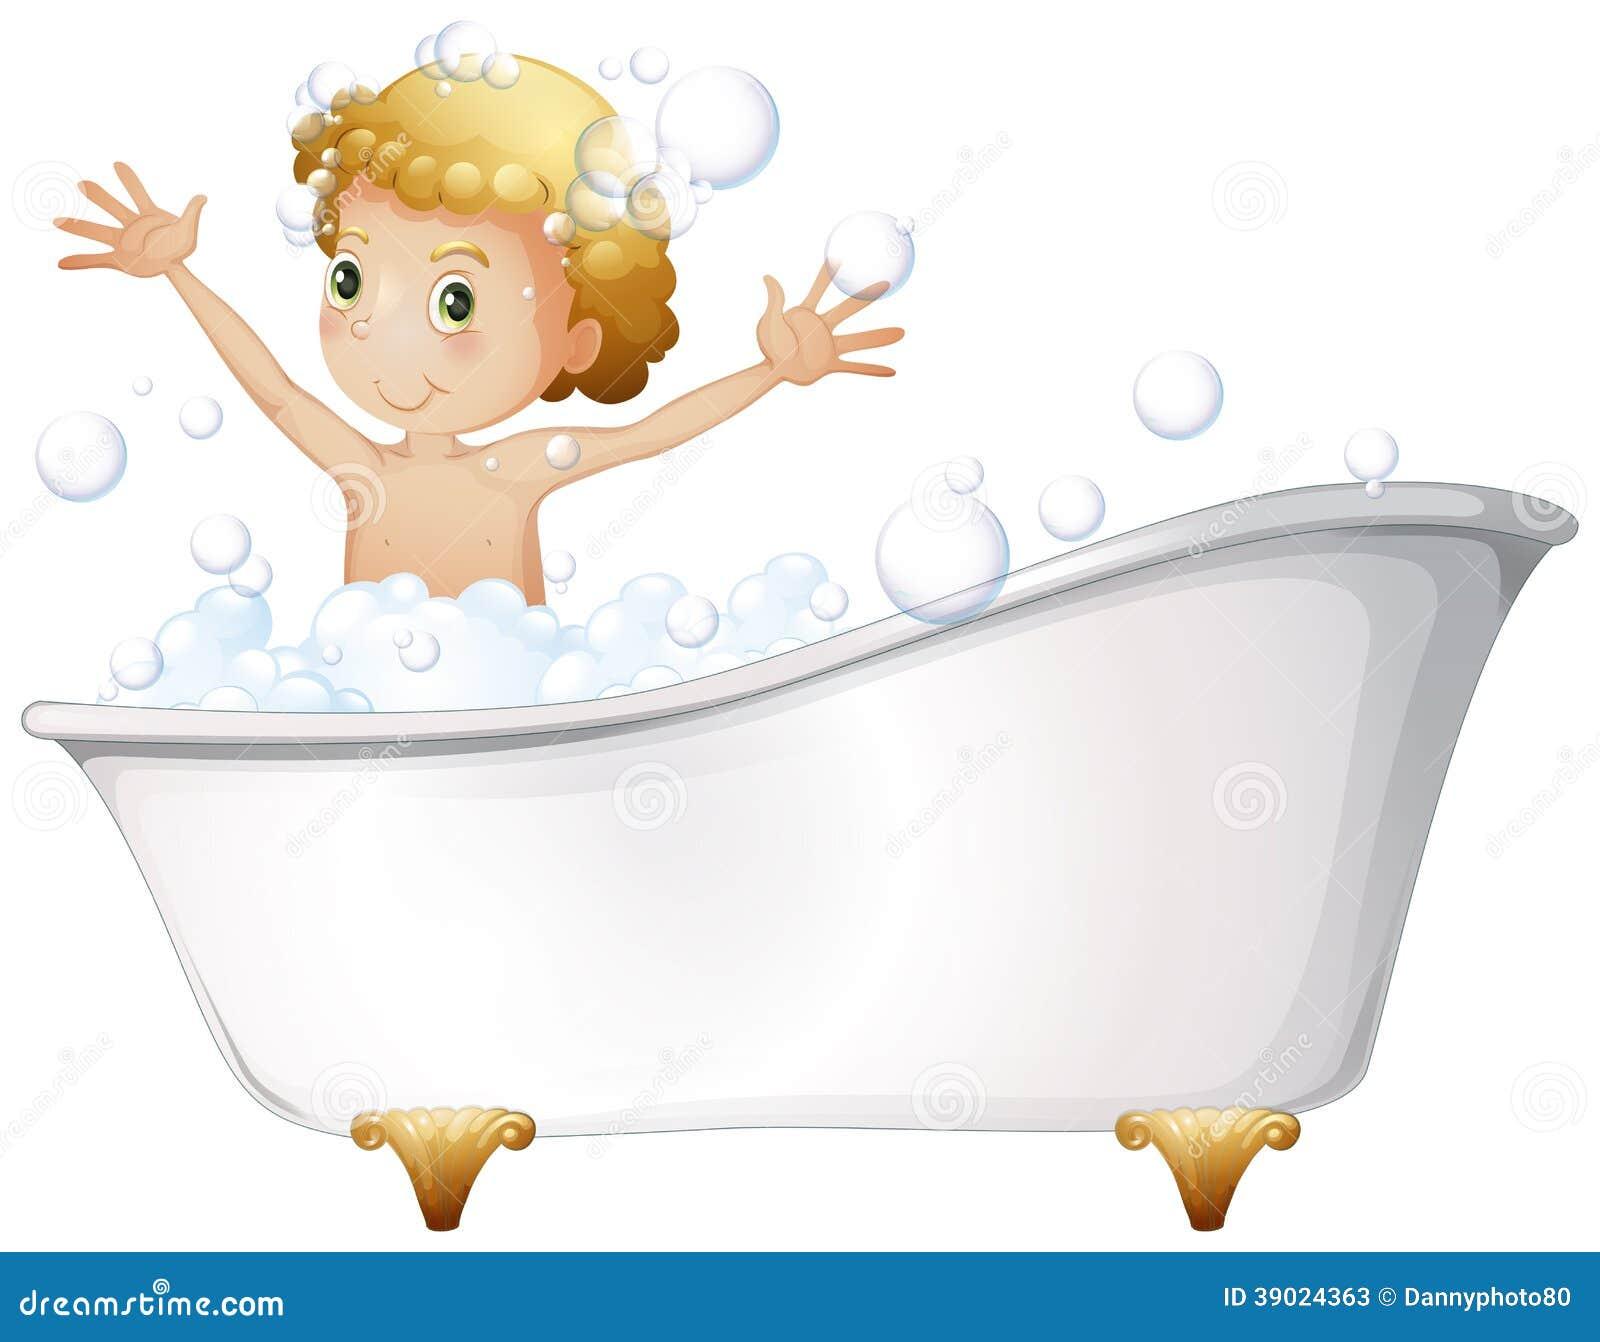 A Young Boy Taking A Bath At The Bathtub Stock Vector